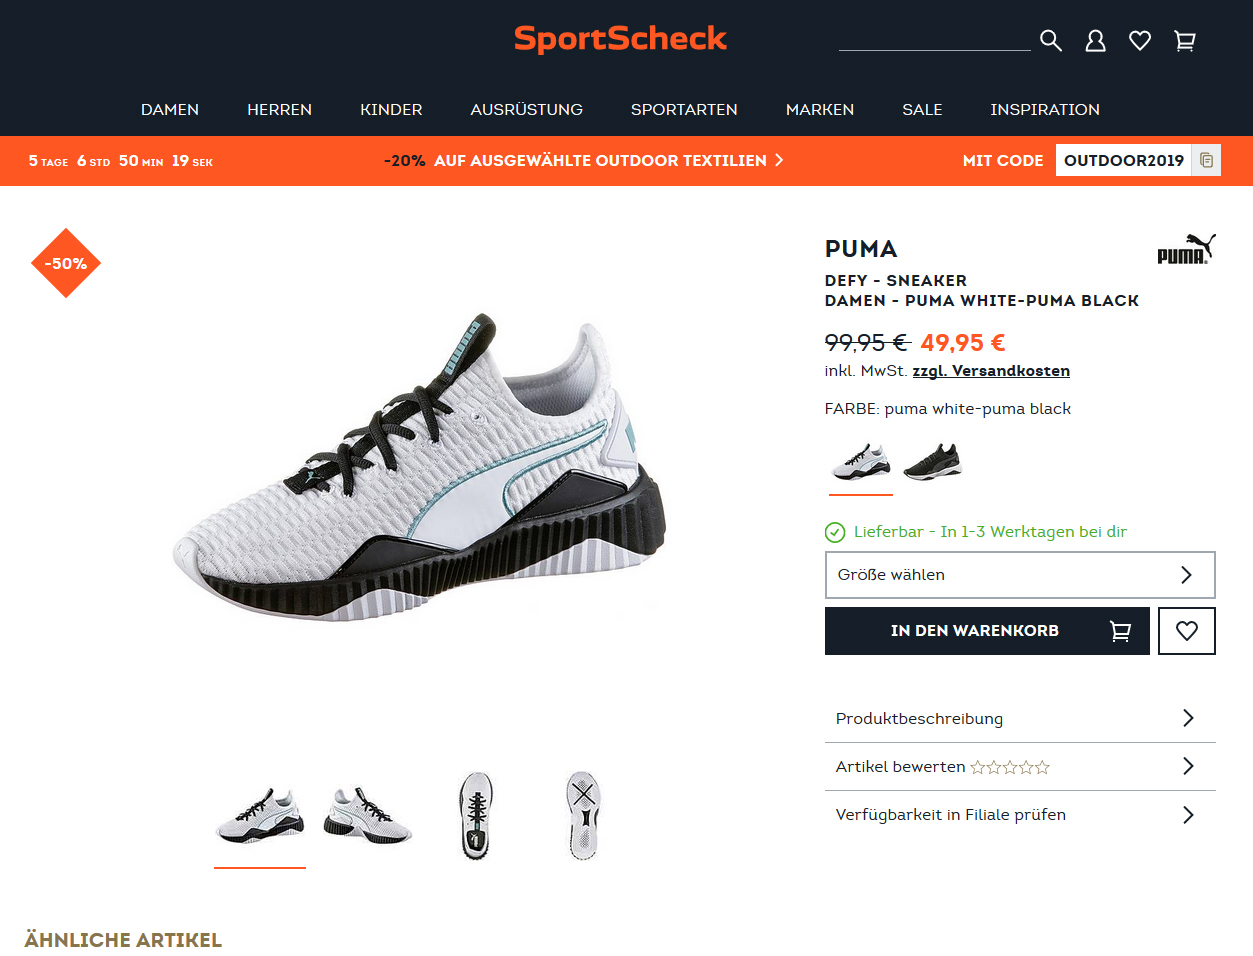 PUMA DEFY Sneaker Damen puma white puma black für nur 49